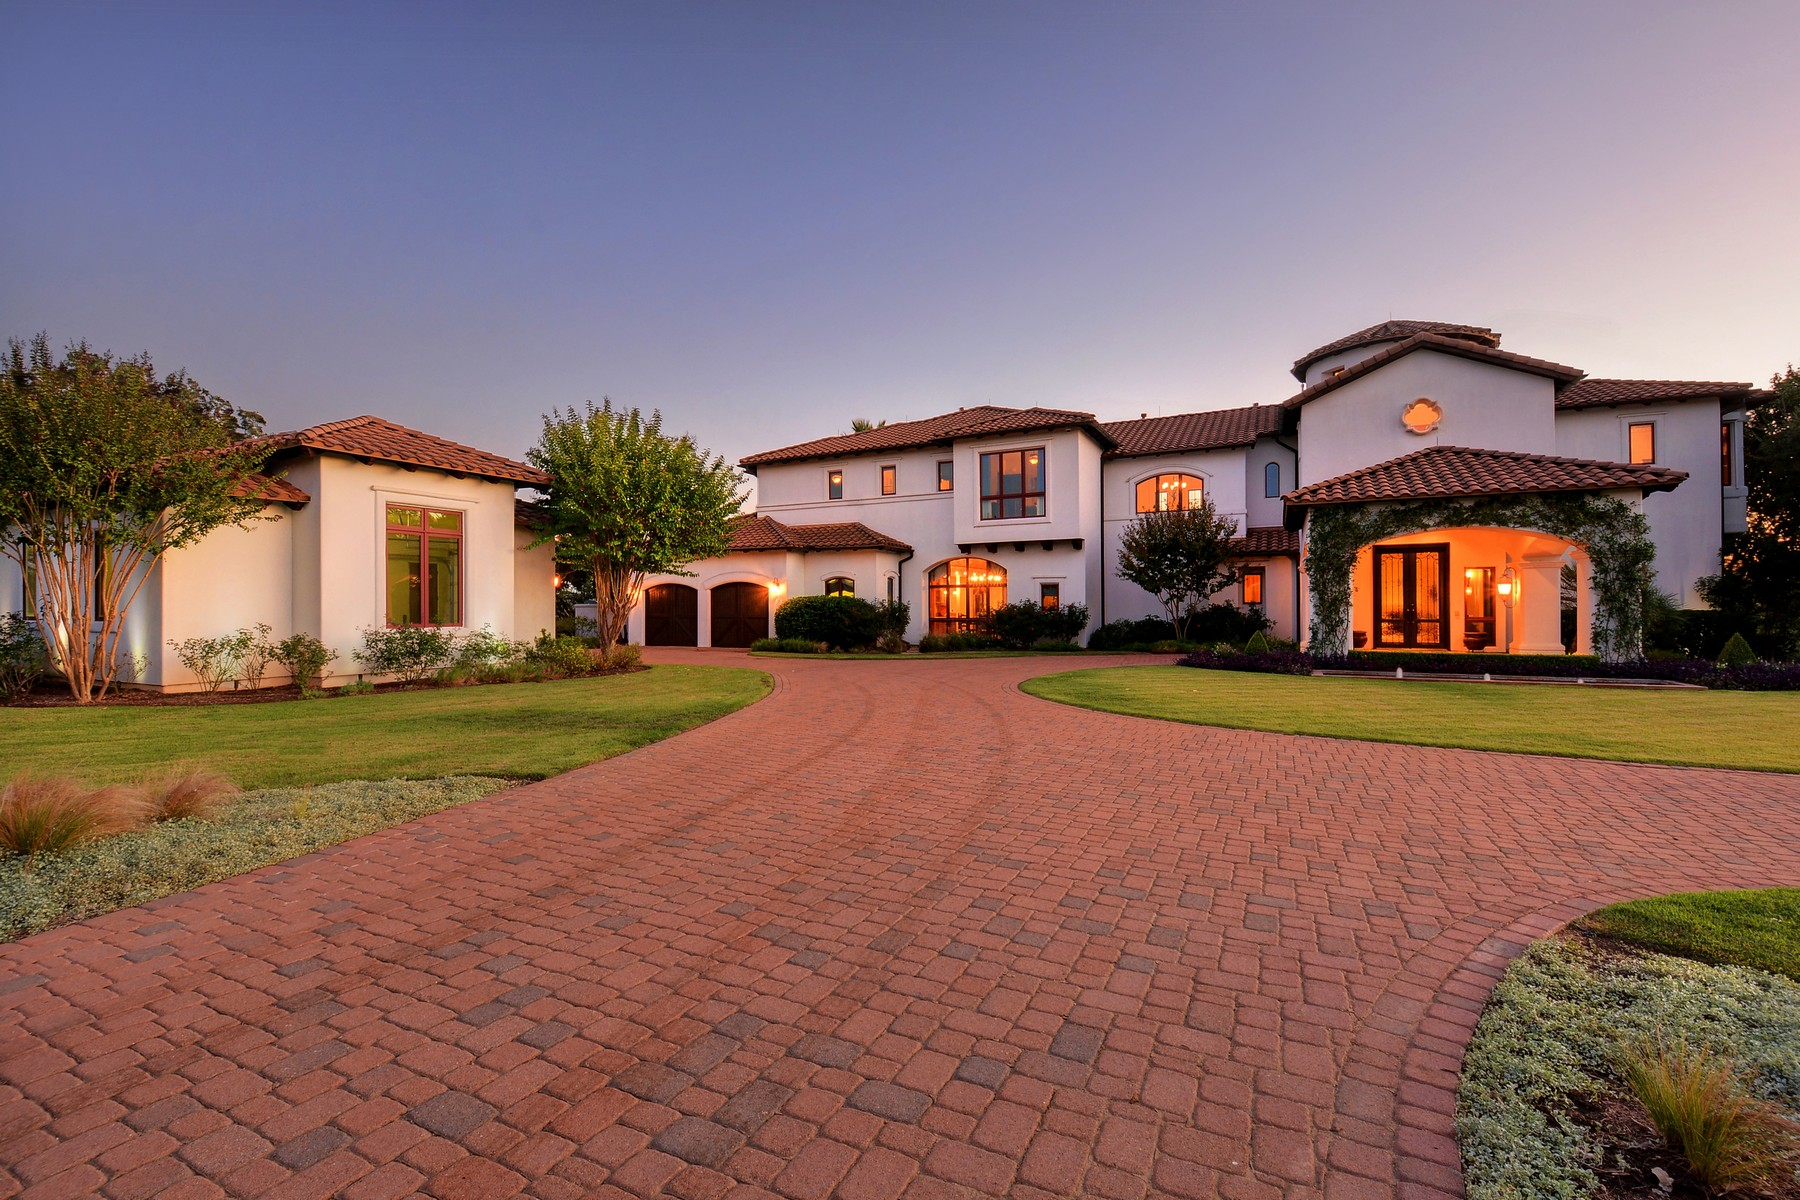 Casa Unifamiliar por un Venta en Luxurious Home on 37 Acres 25211 State Hwy 71 W Spicewood, Texas 78669 Estados Unidos